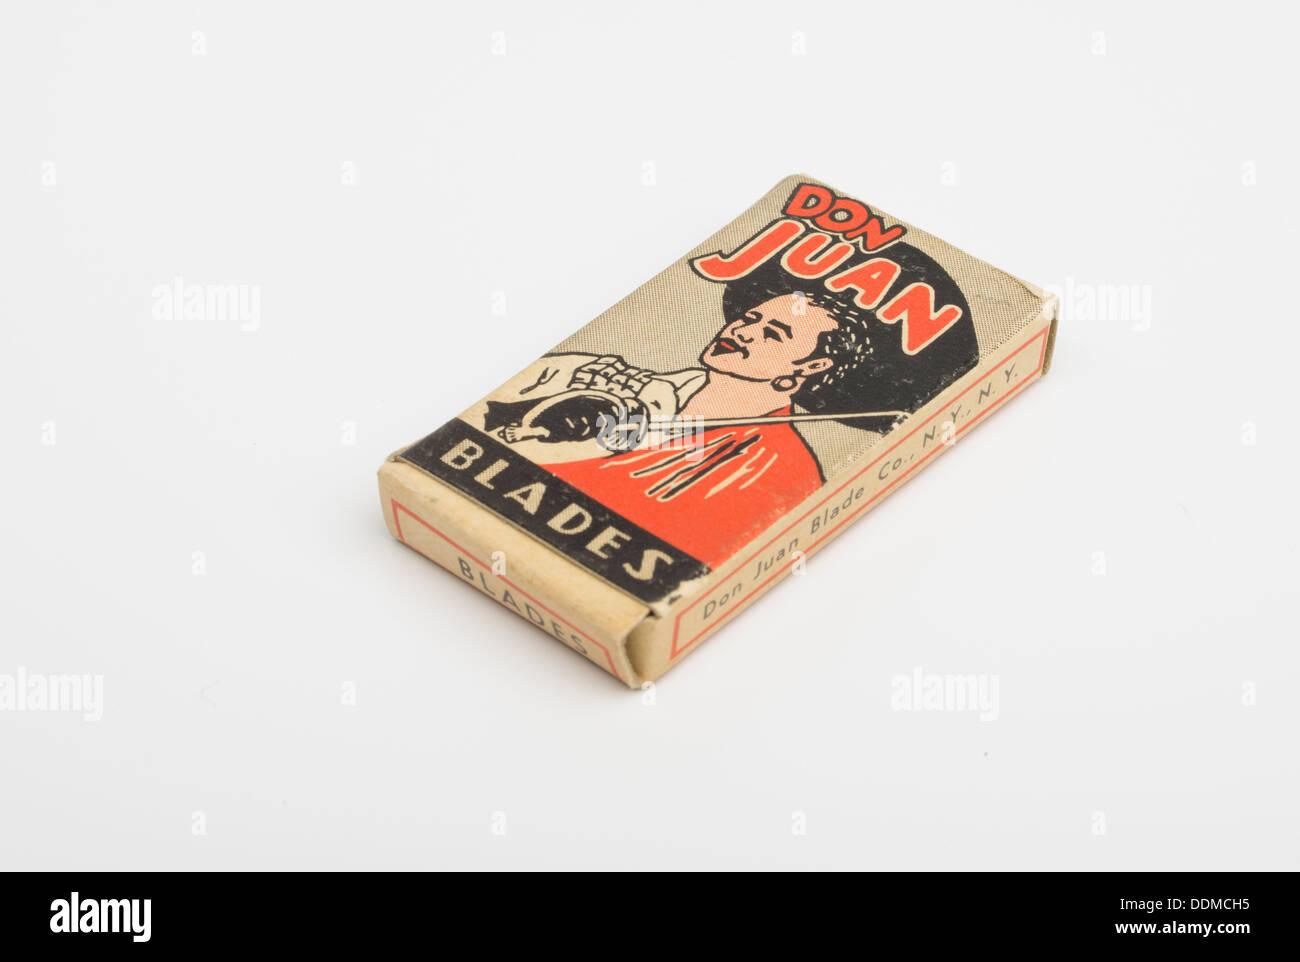 Don Juan shaving blades vintage box from 1960's - Stock Image